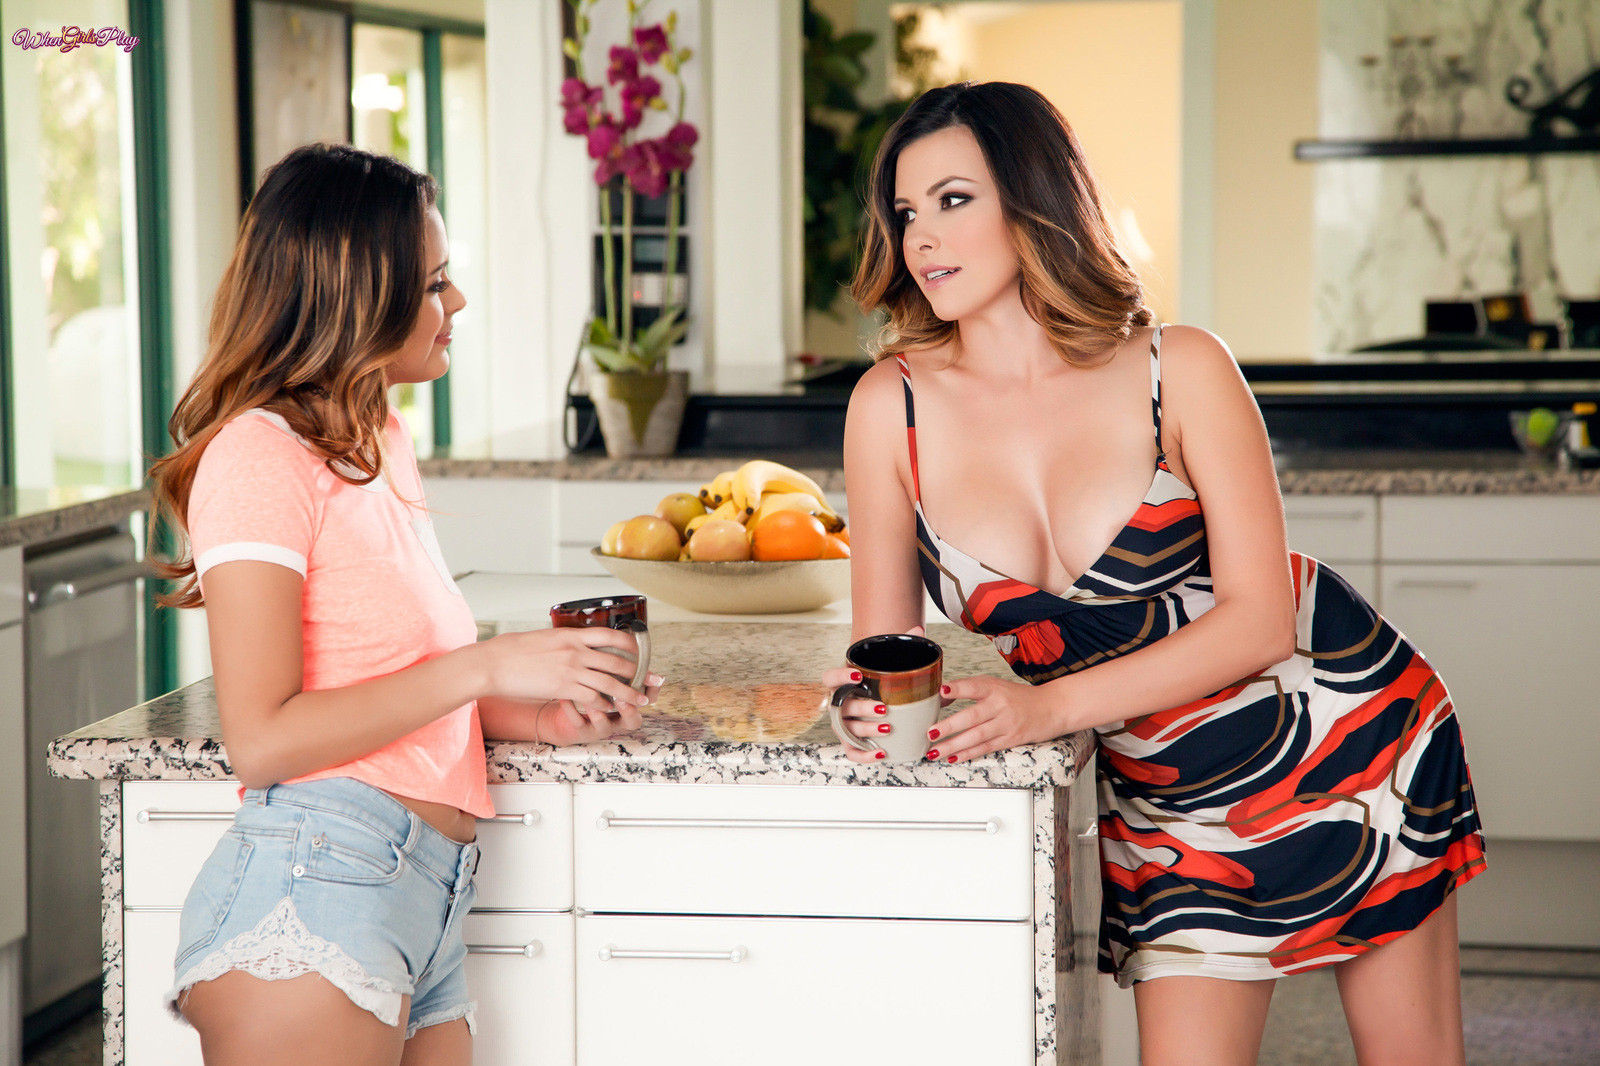 Josie Jagger, Danica Dillan - На кухне - Галерея № 3492426